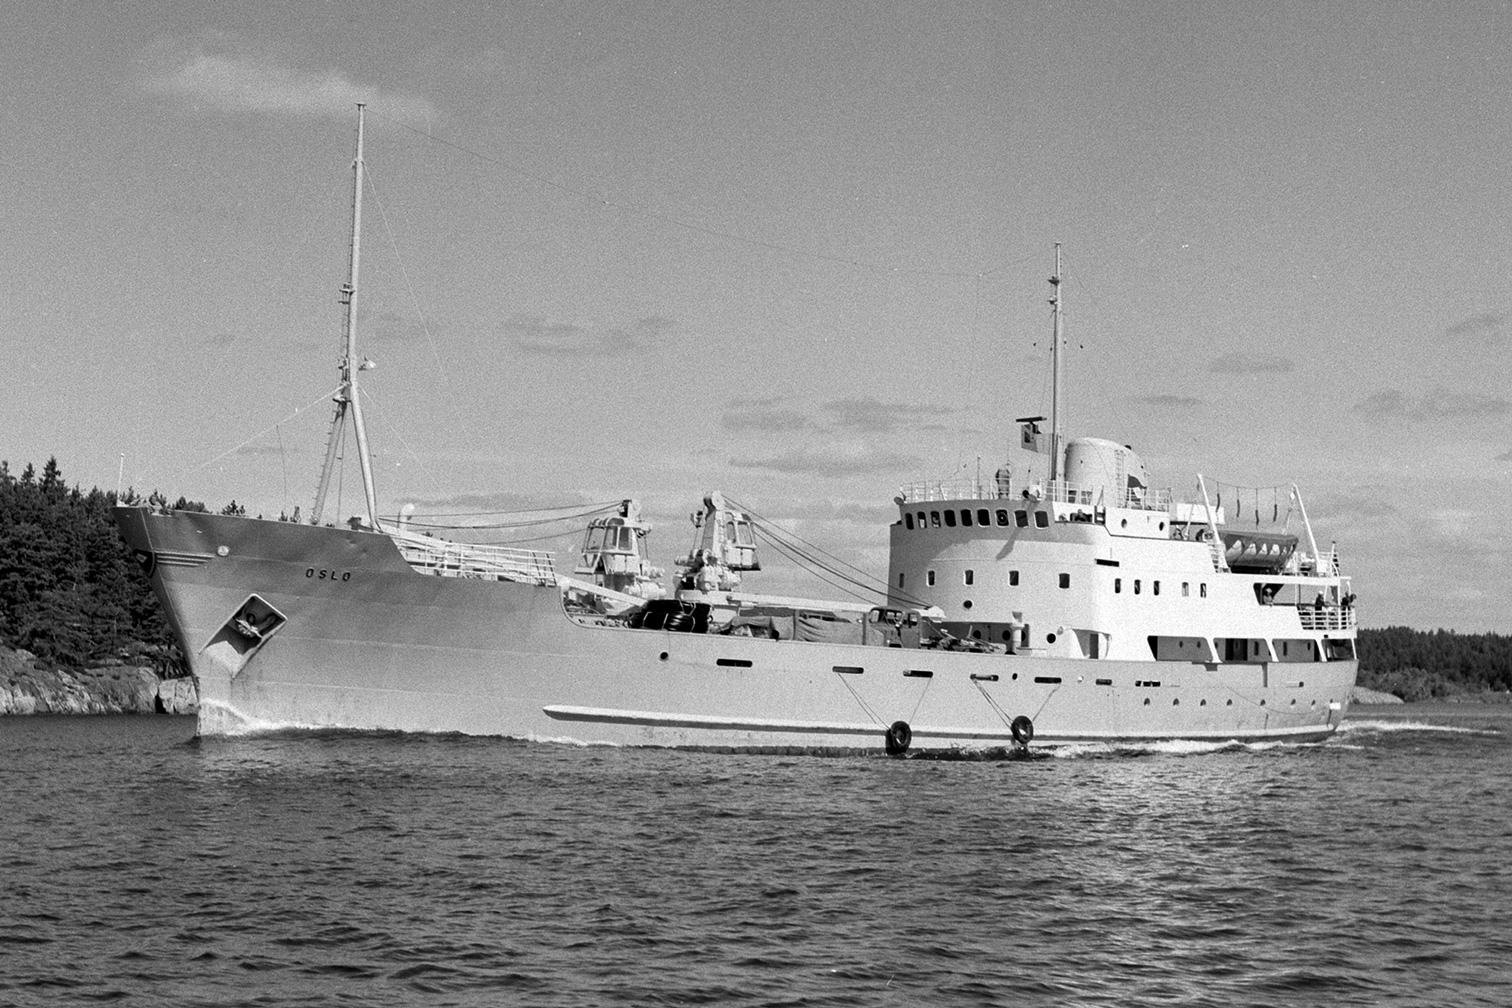 MV Oslo II